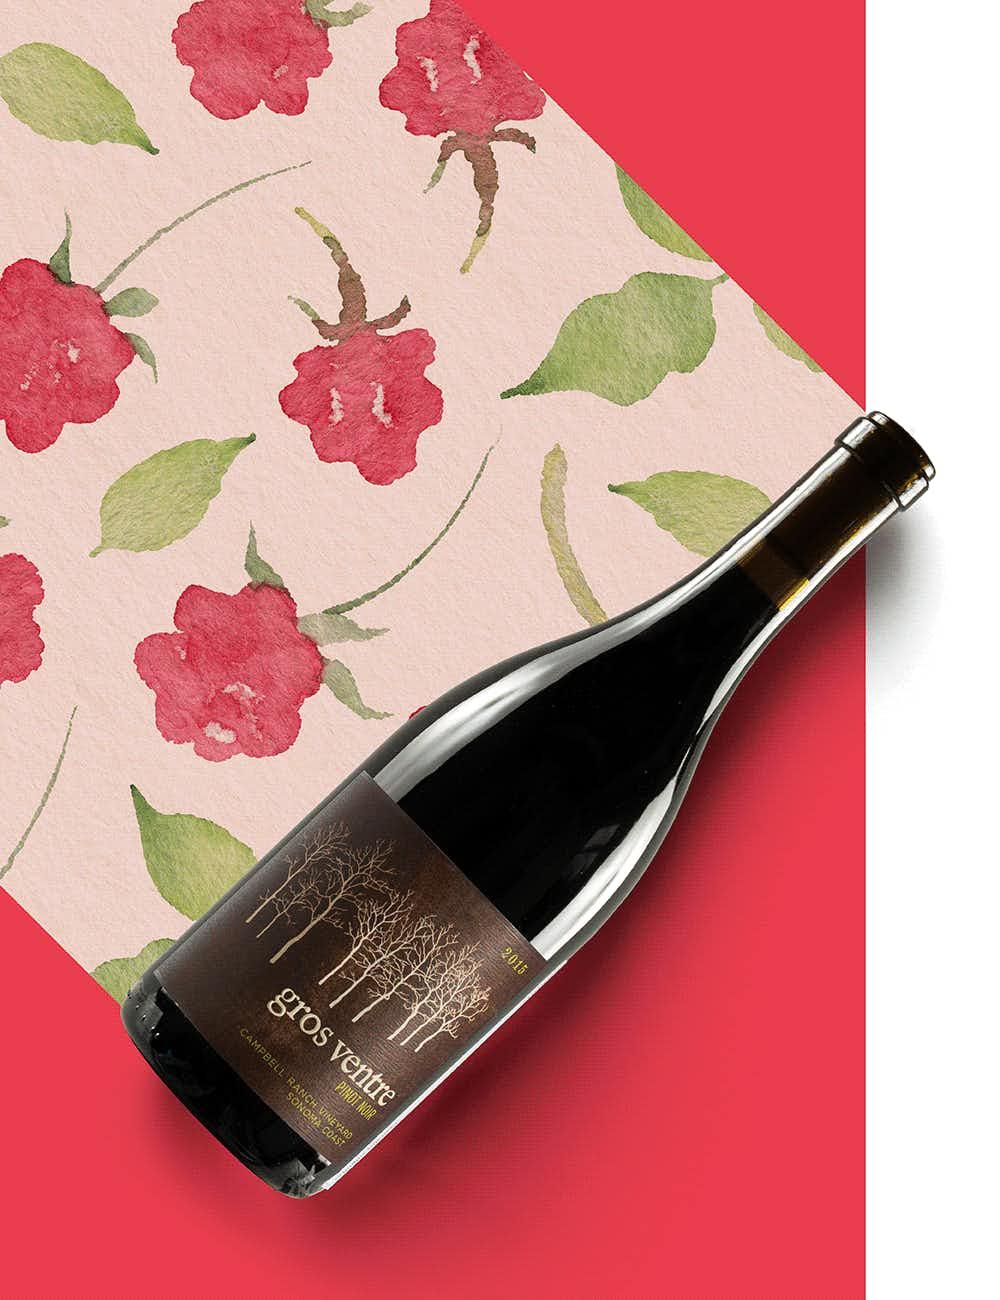 Gros Ventre Campbell Ranch Pinot Noir 2015